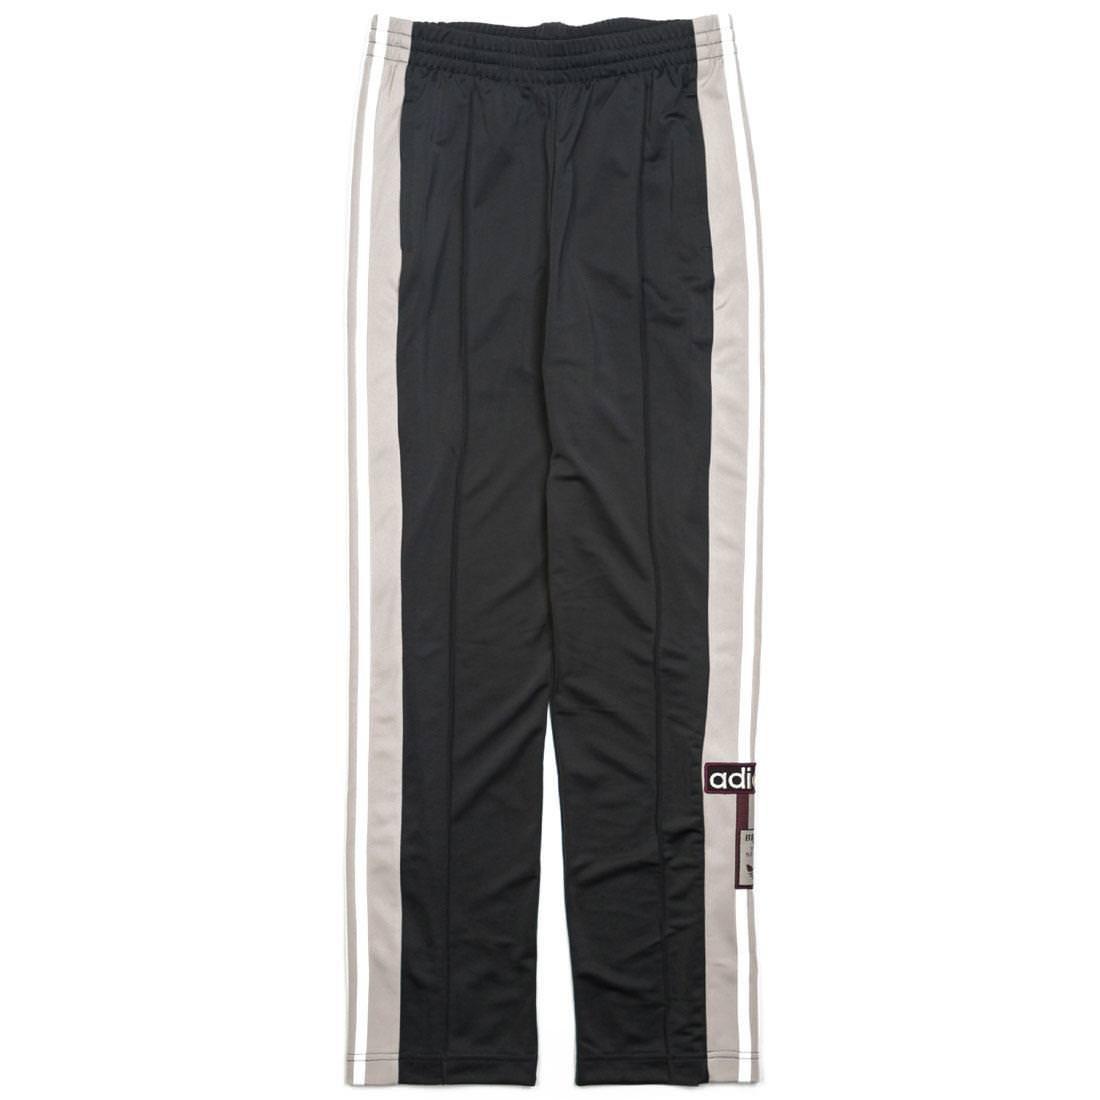 3eab0a07f12a75 adidas Originals Womens Adi Break Track Pants at Amazon Women's Clothing  store: